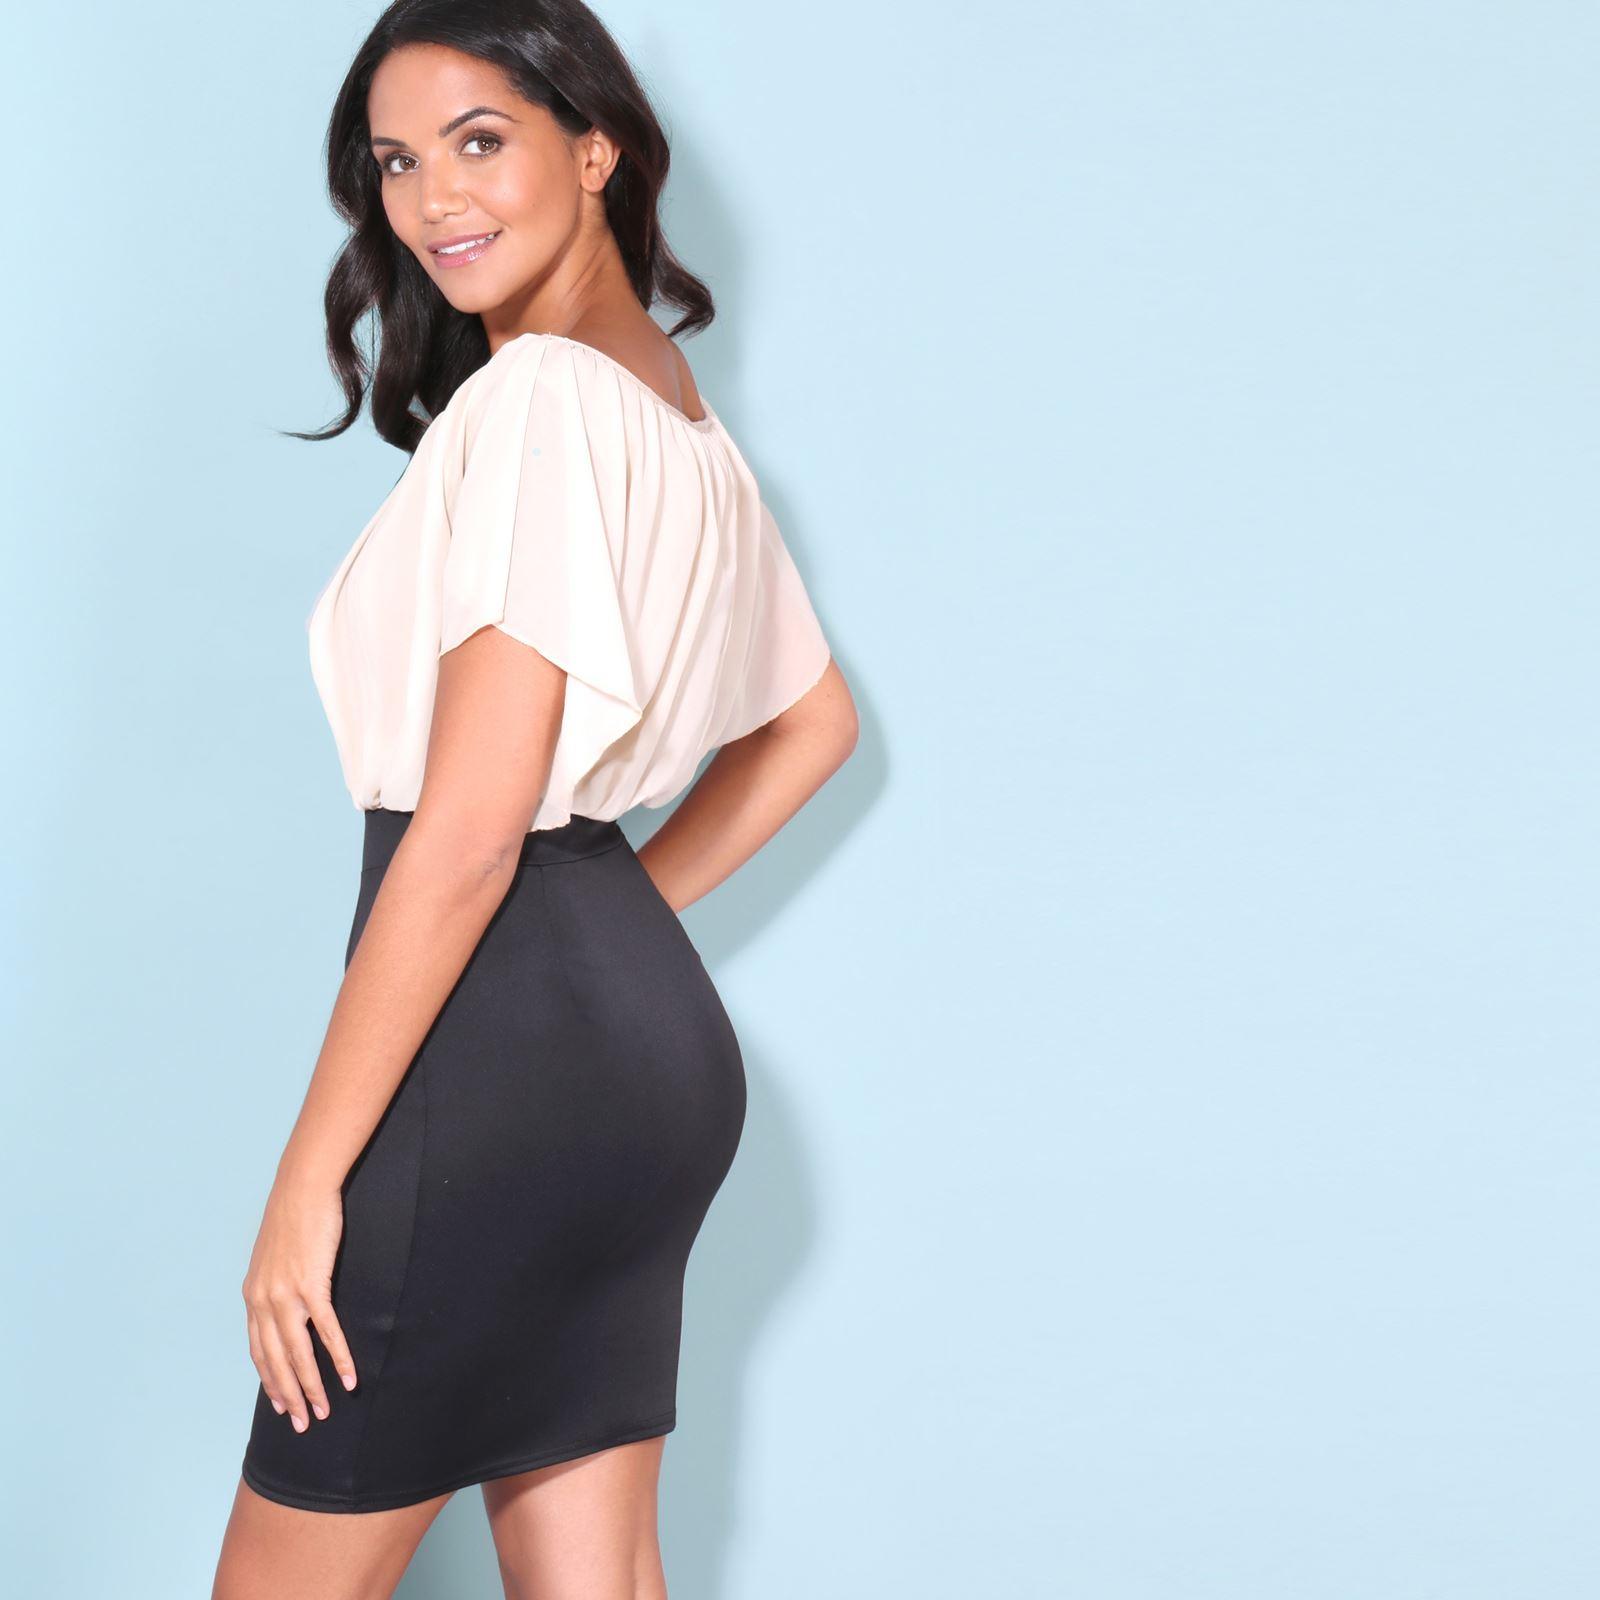 Womens-Pleated-Chiffon-Batwing-Top-High-Waist-Pencil-Bodycon-Skirt-Mini-Dress thumbnail 34